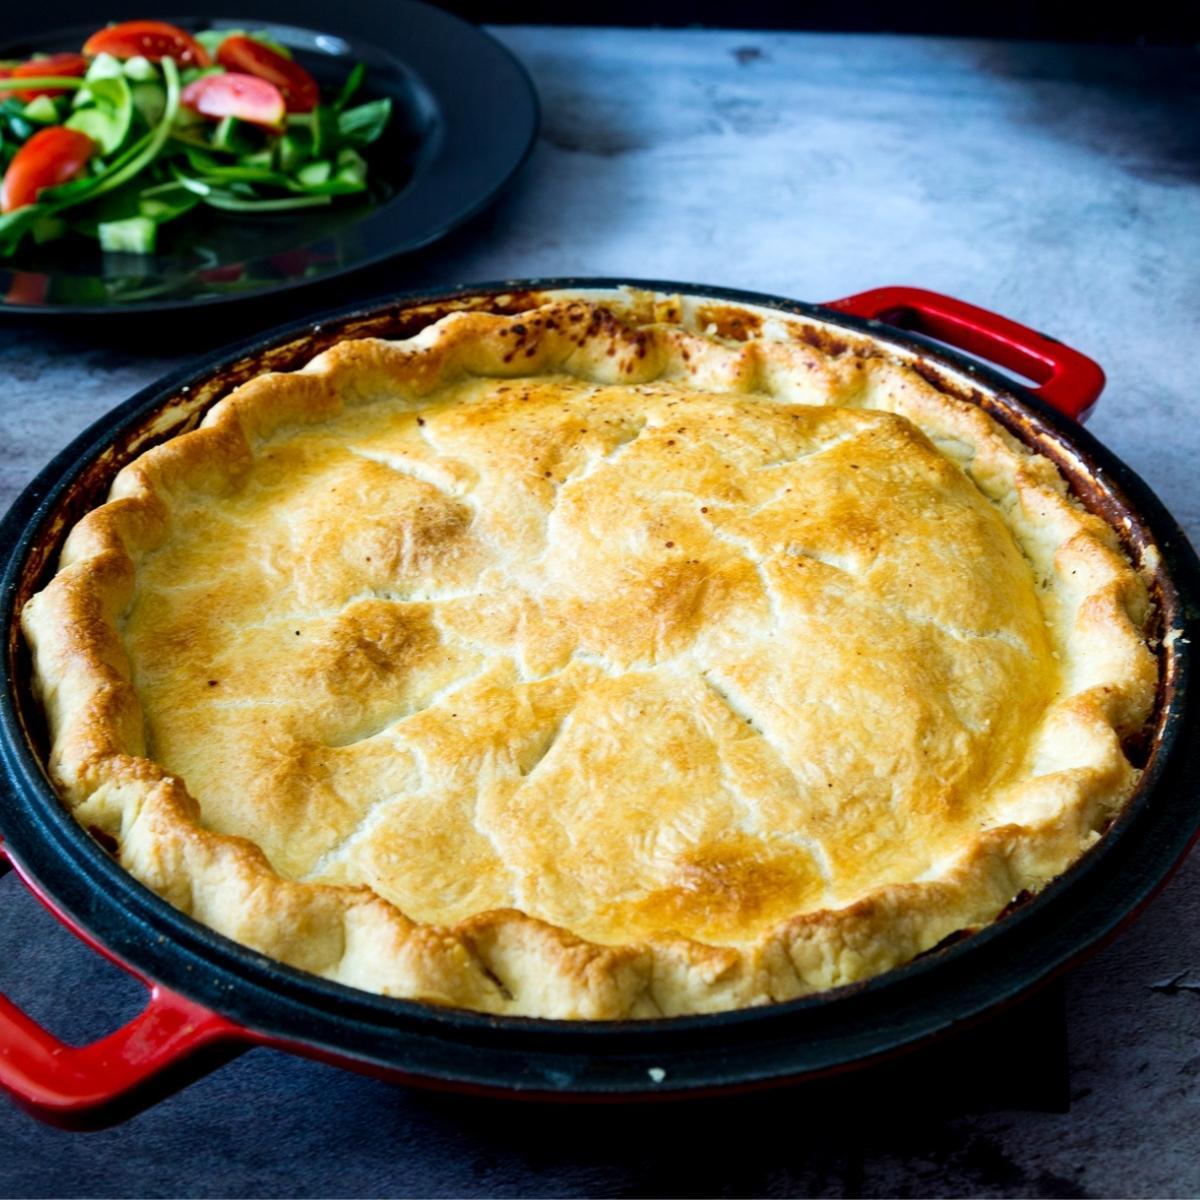 A skillet with chicken pot pie recipe